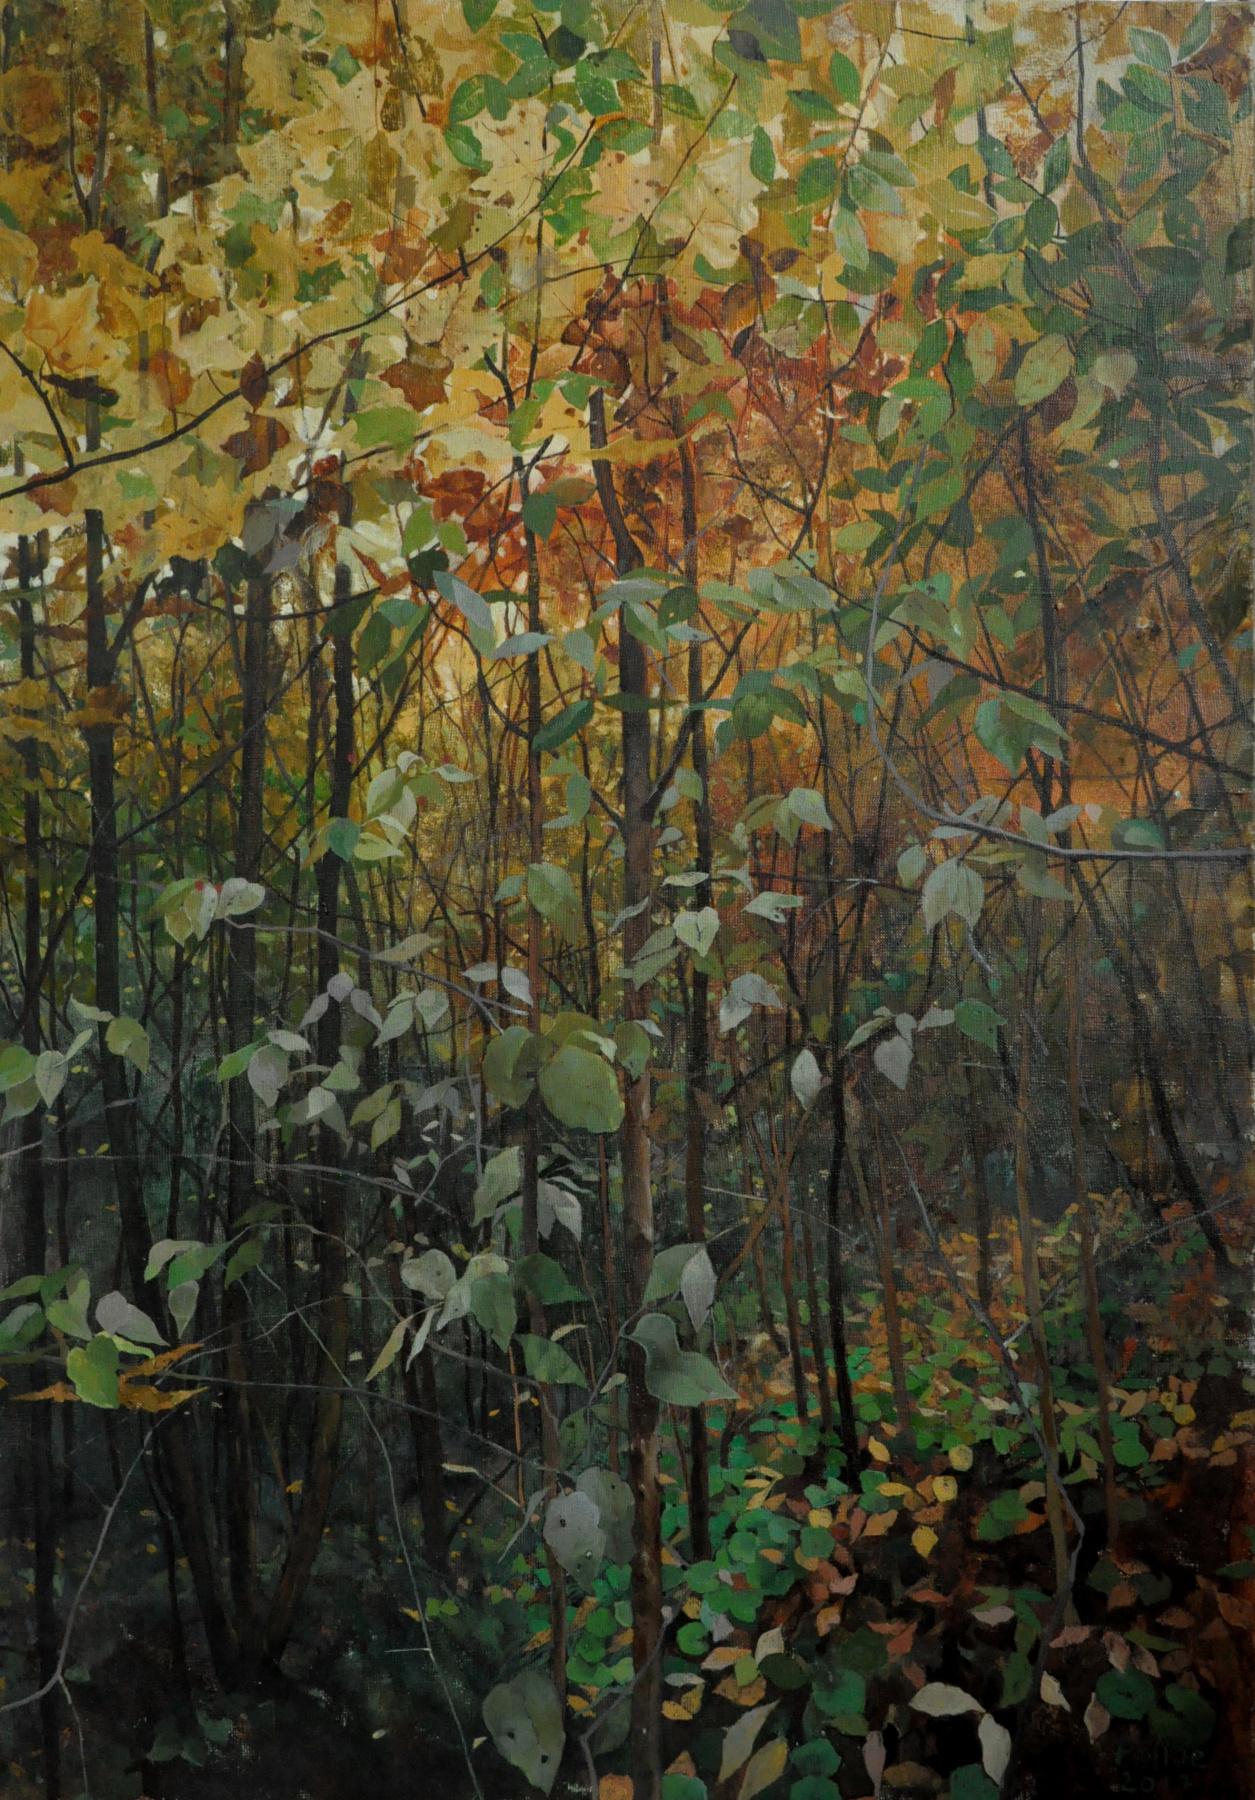 Polina Kuznetsova. Magic forest